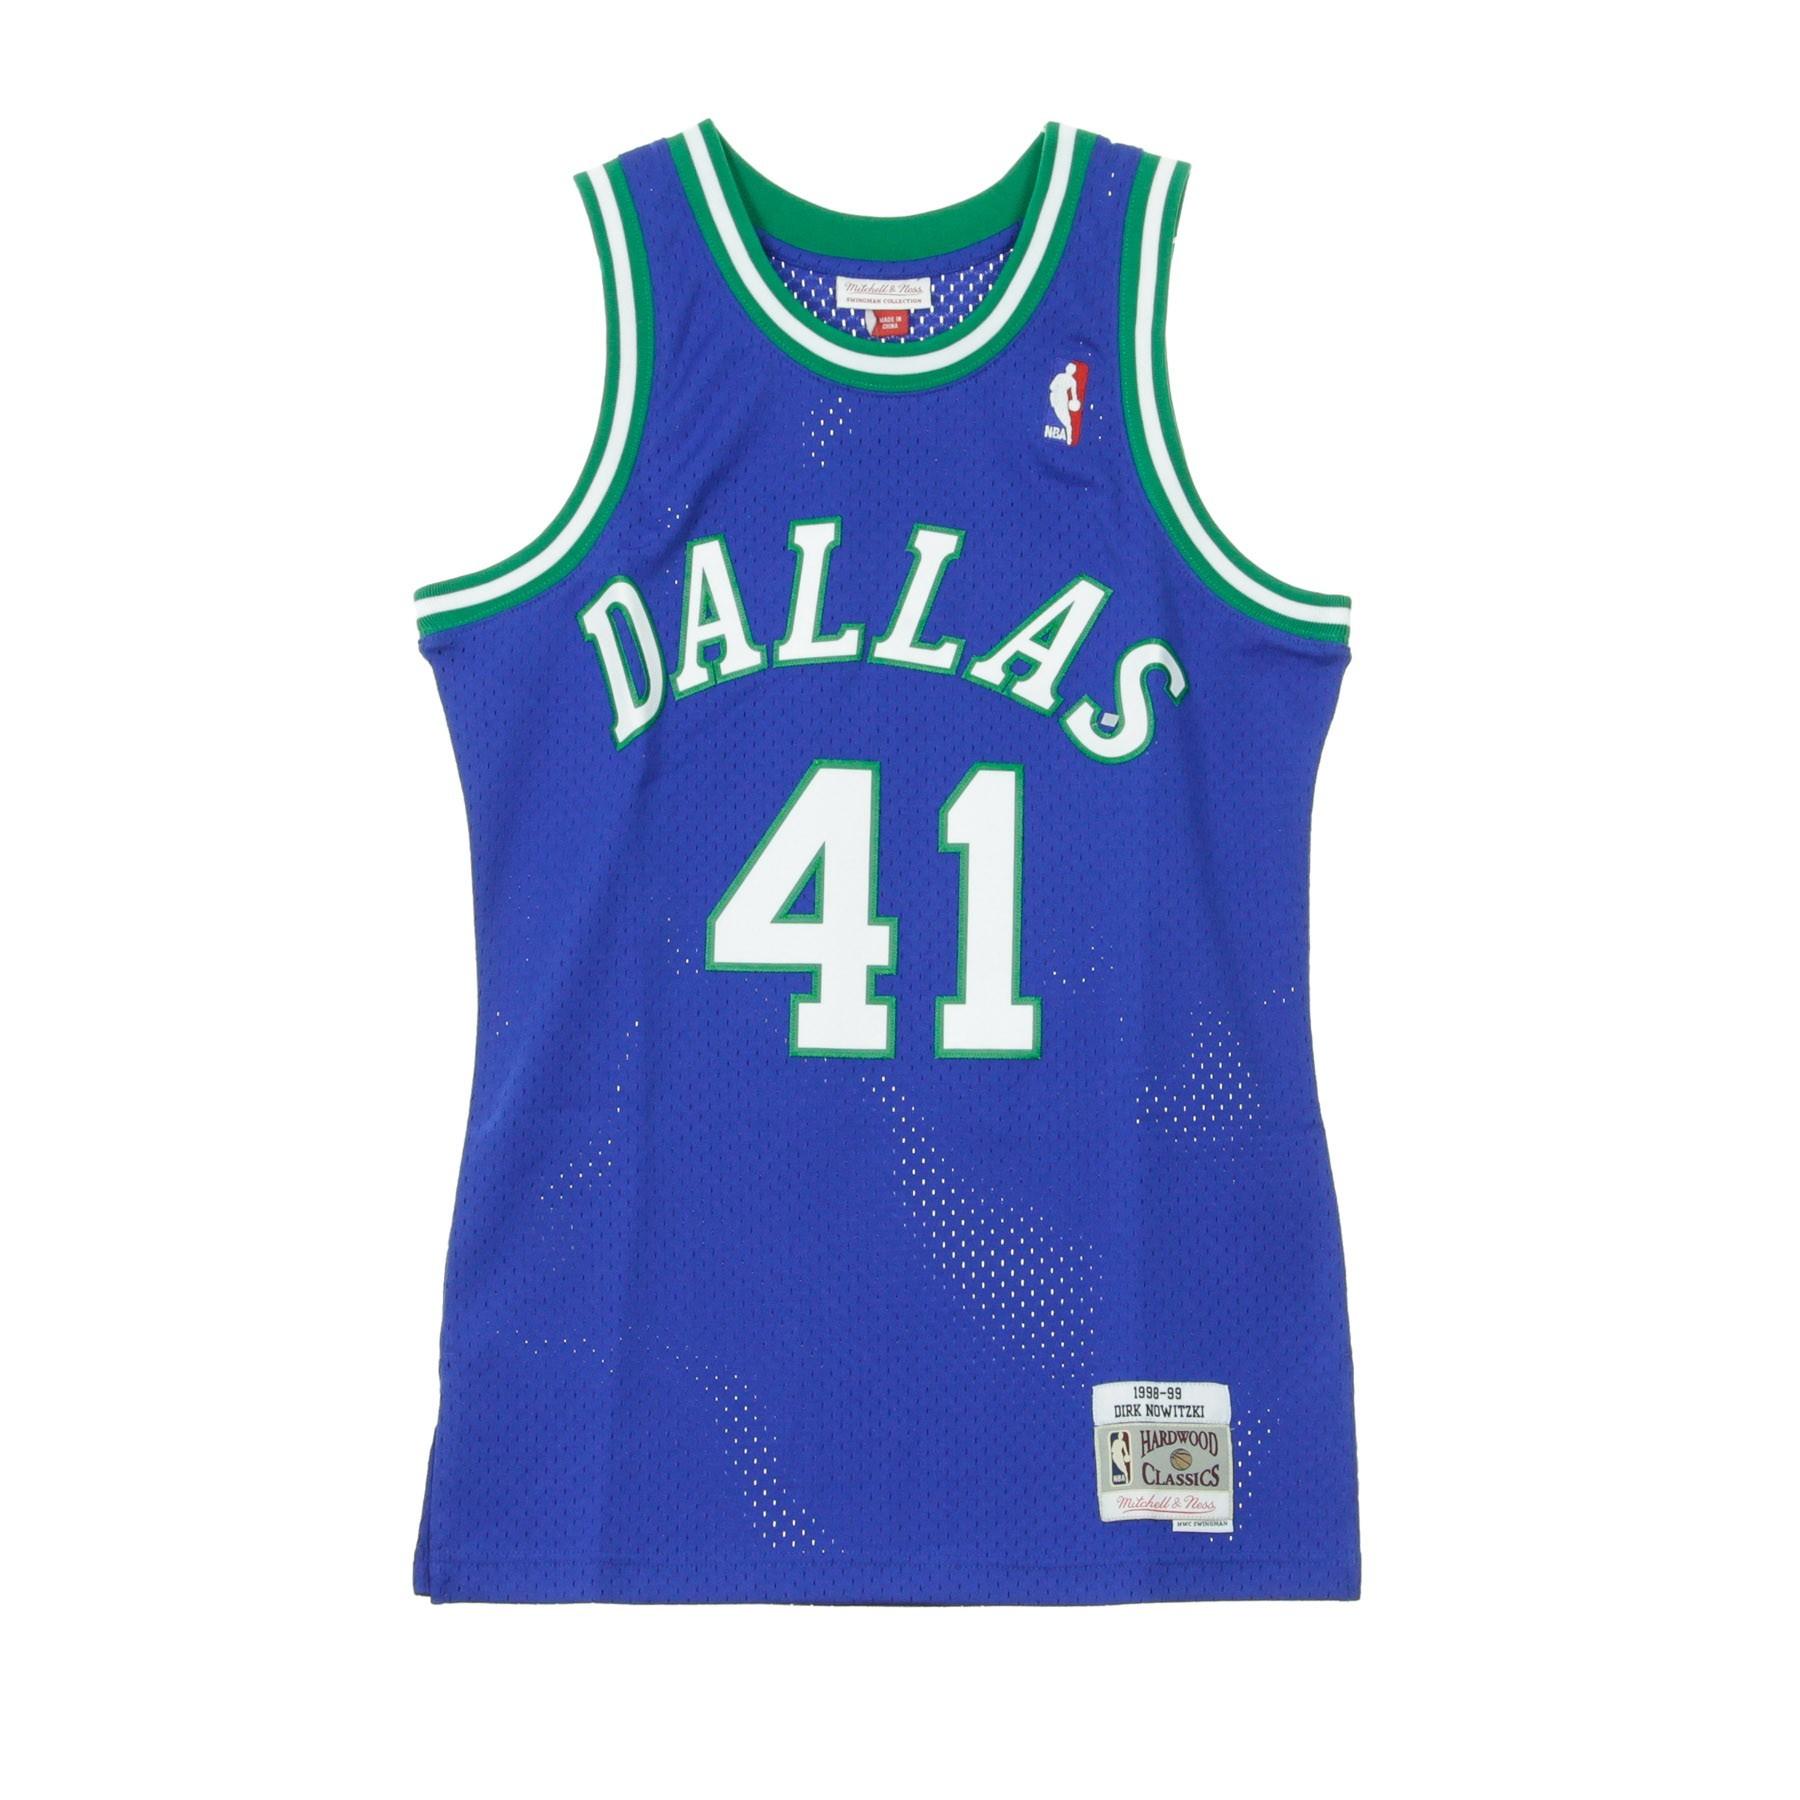 finest selection 09e33 55b6a CANOTTA NBA SWINGMAN JERSEY DIRK NOWITZKI NO41 1998-99 DALMAV ROAD ORIGINAL  TEAM COLORS | Atipicishop.com